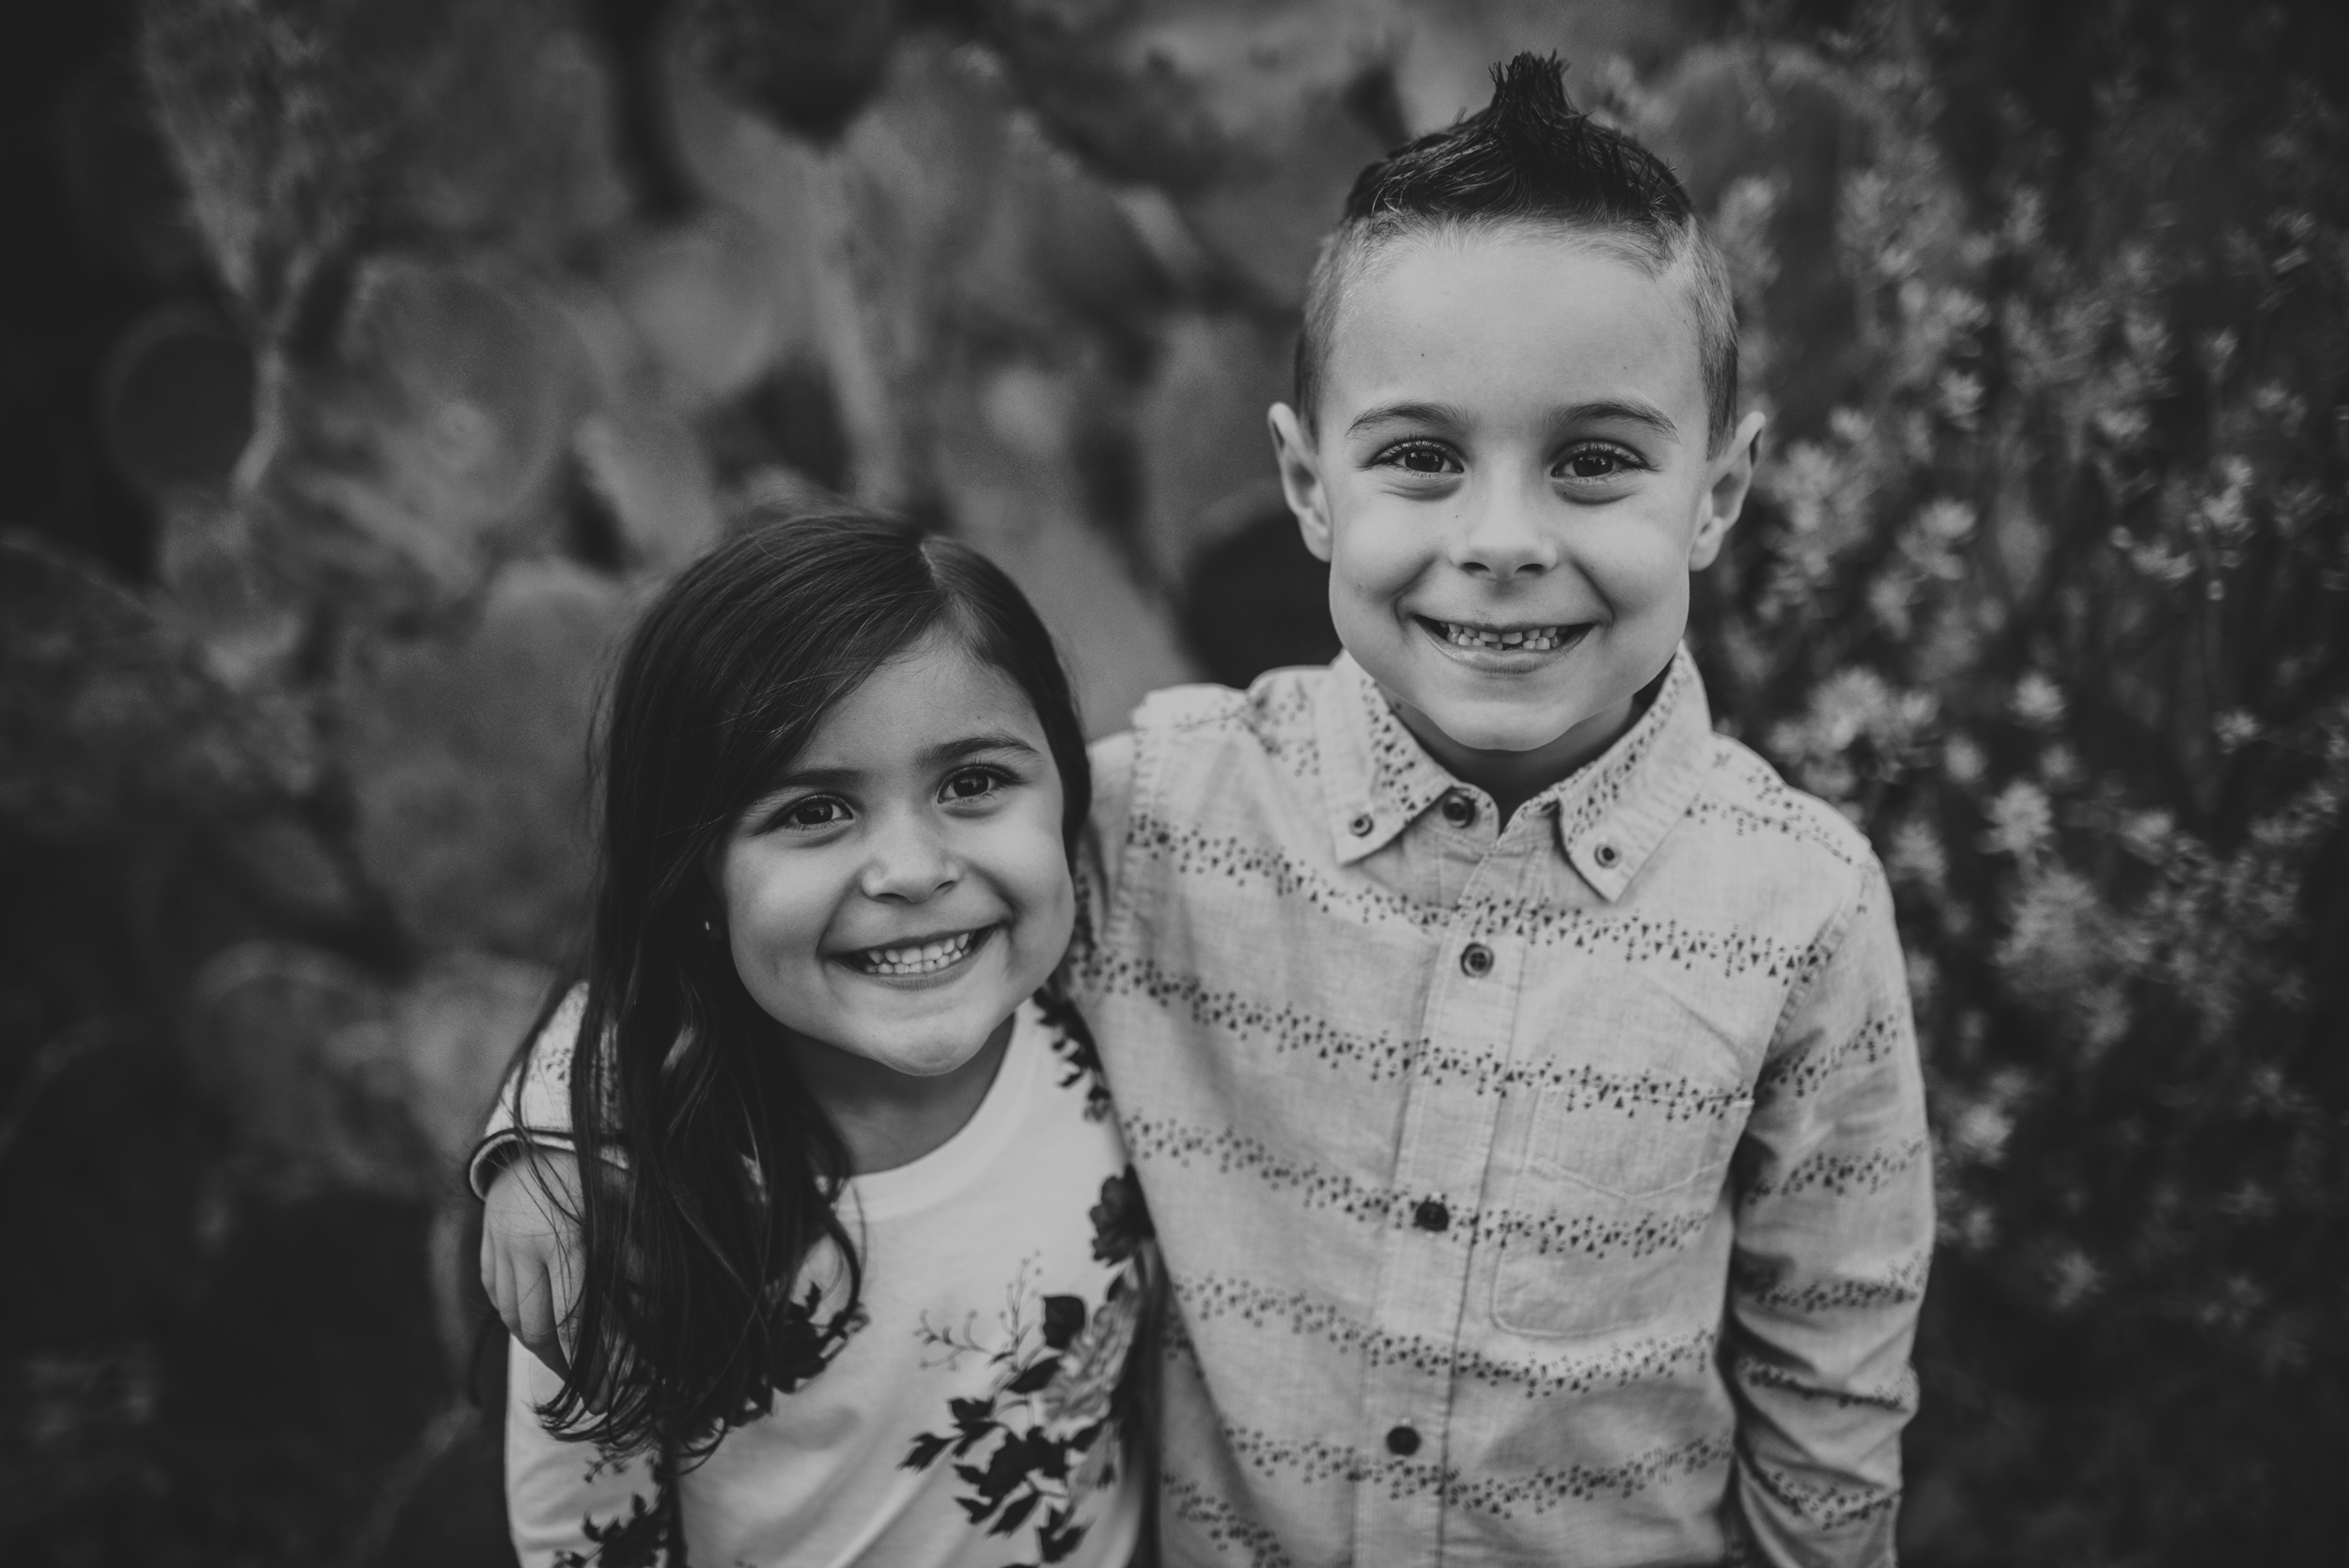 2018-San-Diego-Family-Lifestyle-Newborn-Travel-Vacation-Photographer-Kelsey-Smith-Photography-Coronado-La-Jolla-Encinitas-Solana-Beach-Del-Mar-113.jpg